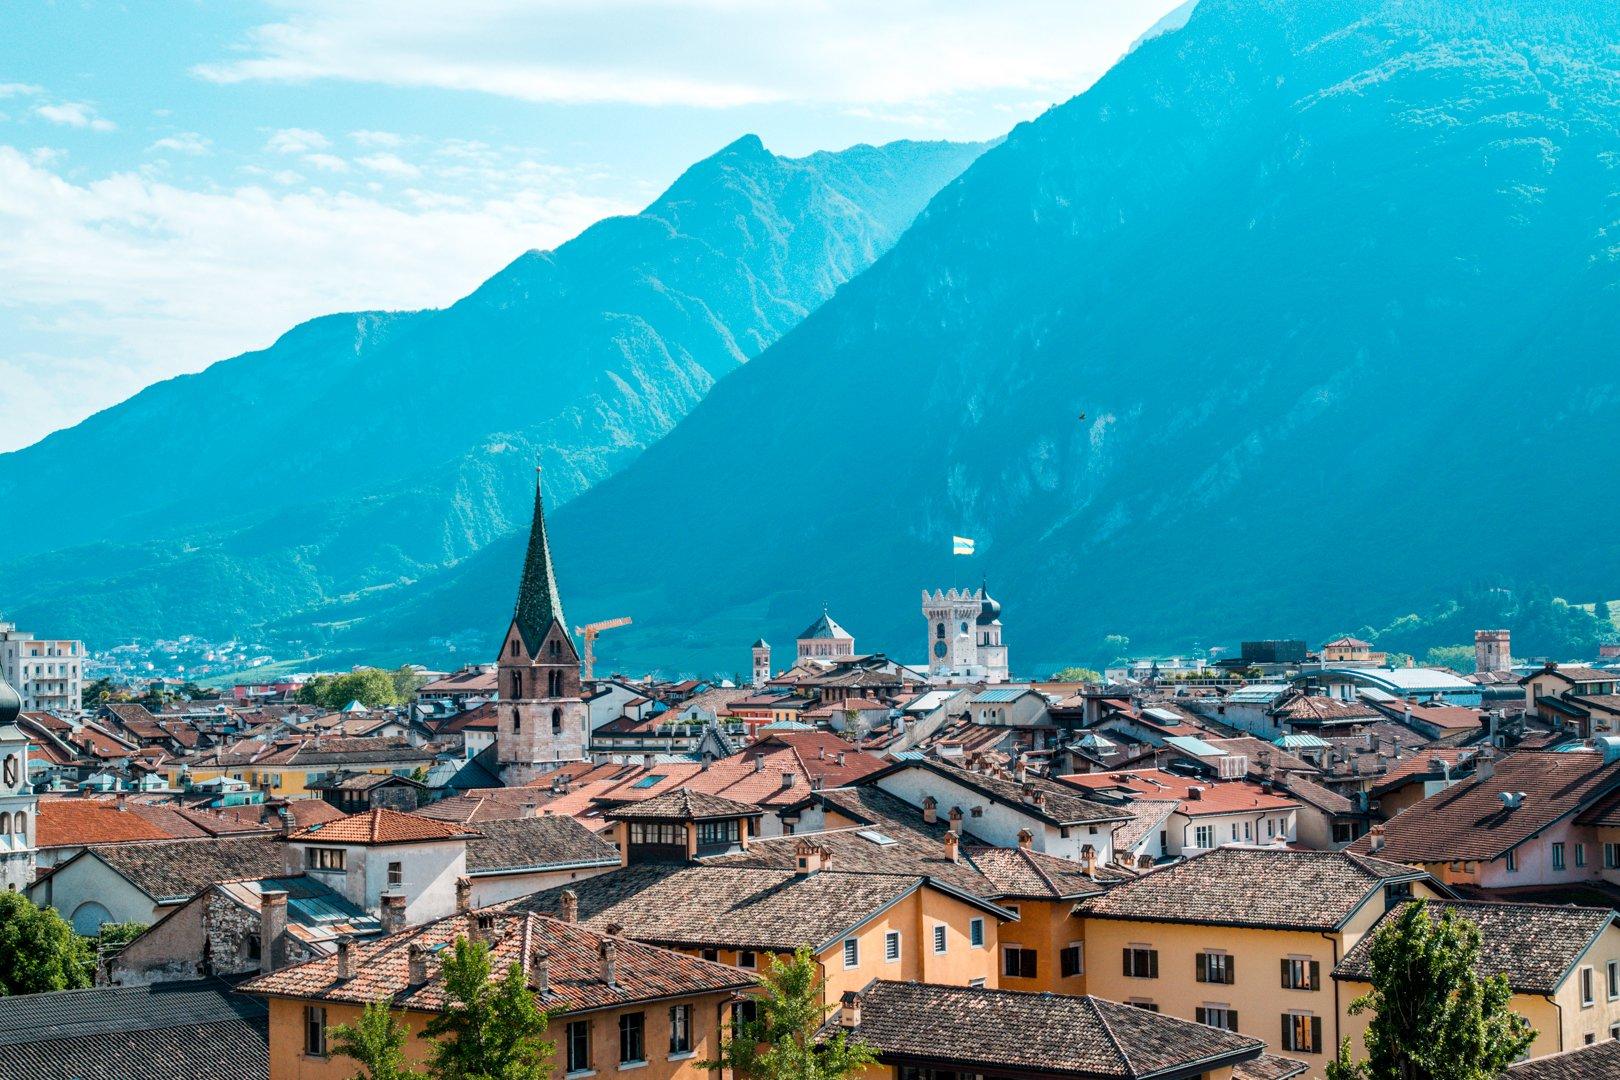 Wat te doen in Trento: de onbekende parel van Noord-Italië